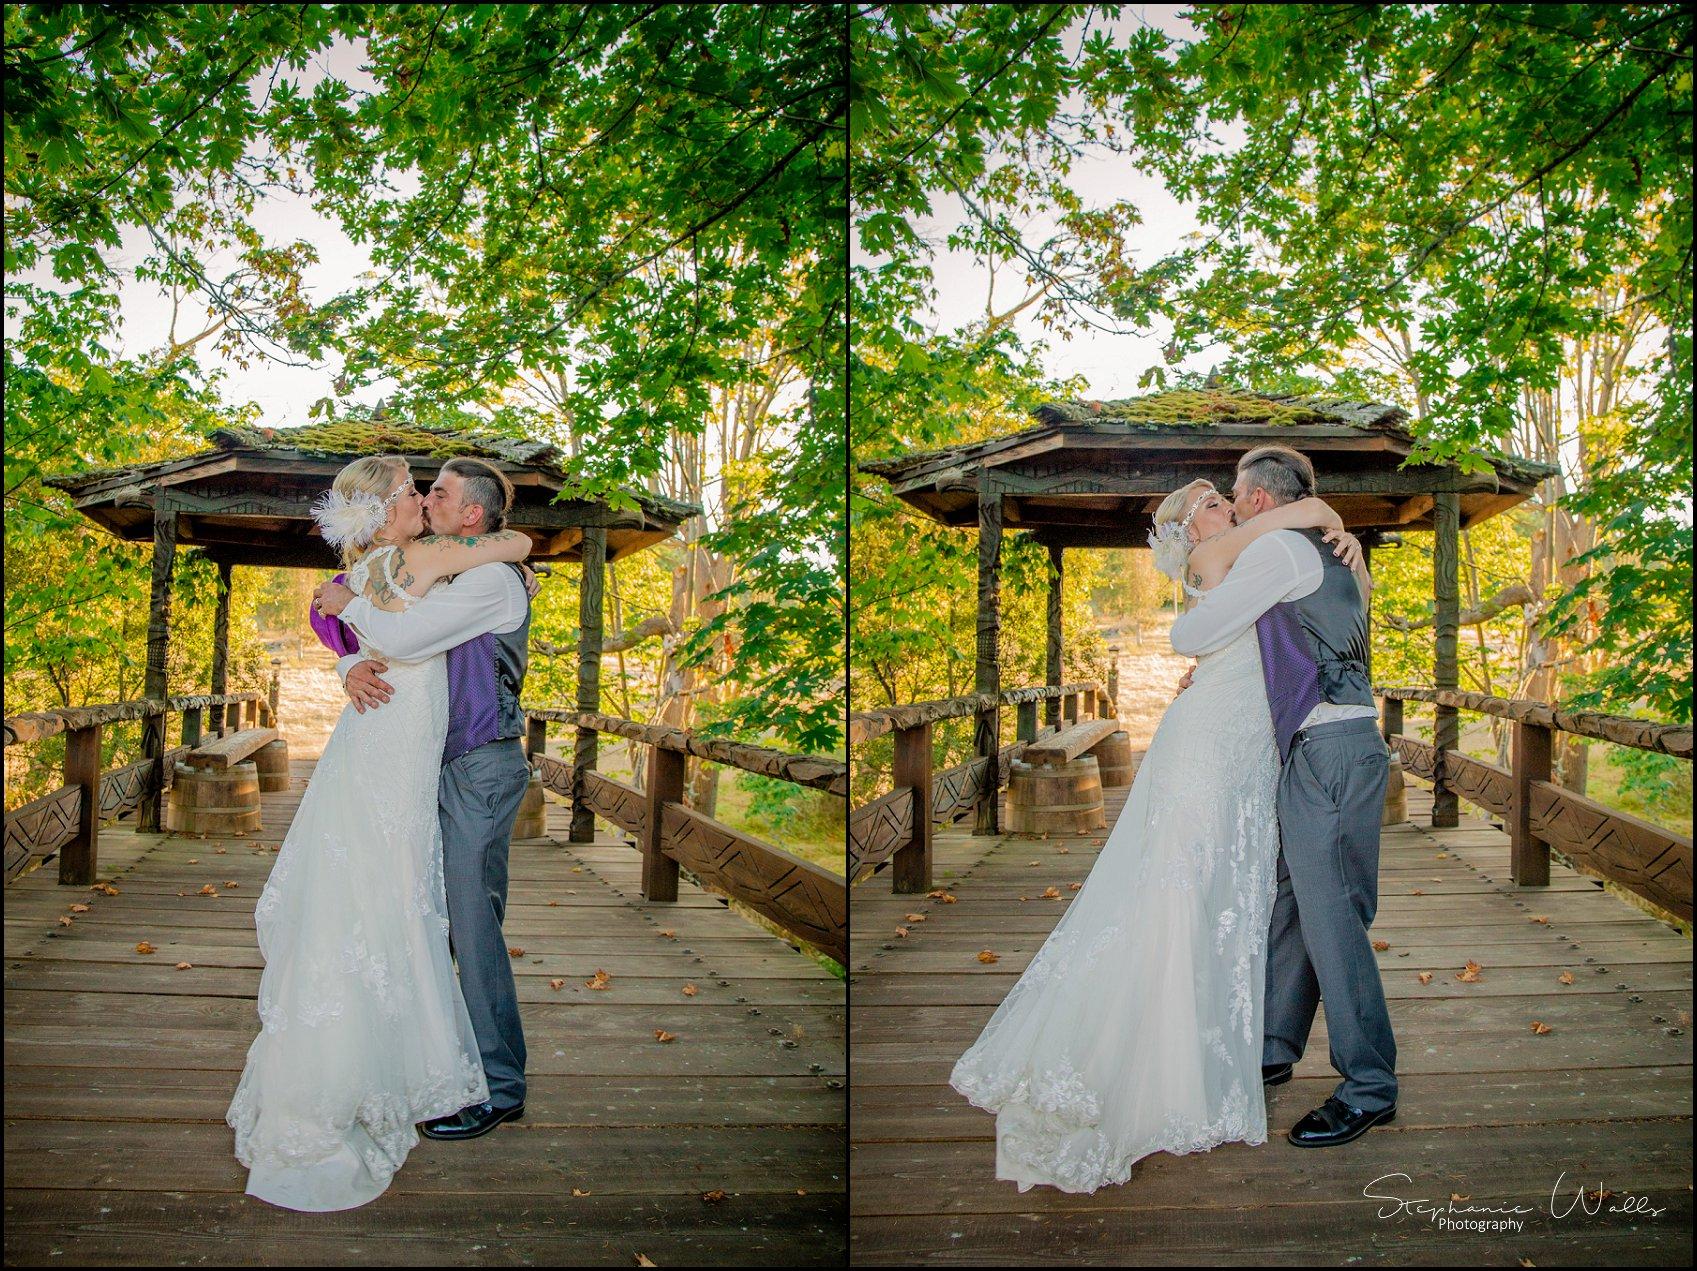 Everist Wedding 057 1 Patti & Bobbys | Troll Haven Castle & Bandy Farms | Sequim, Wa Wedding Photographer